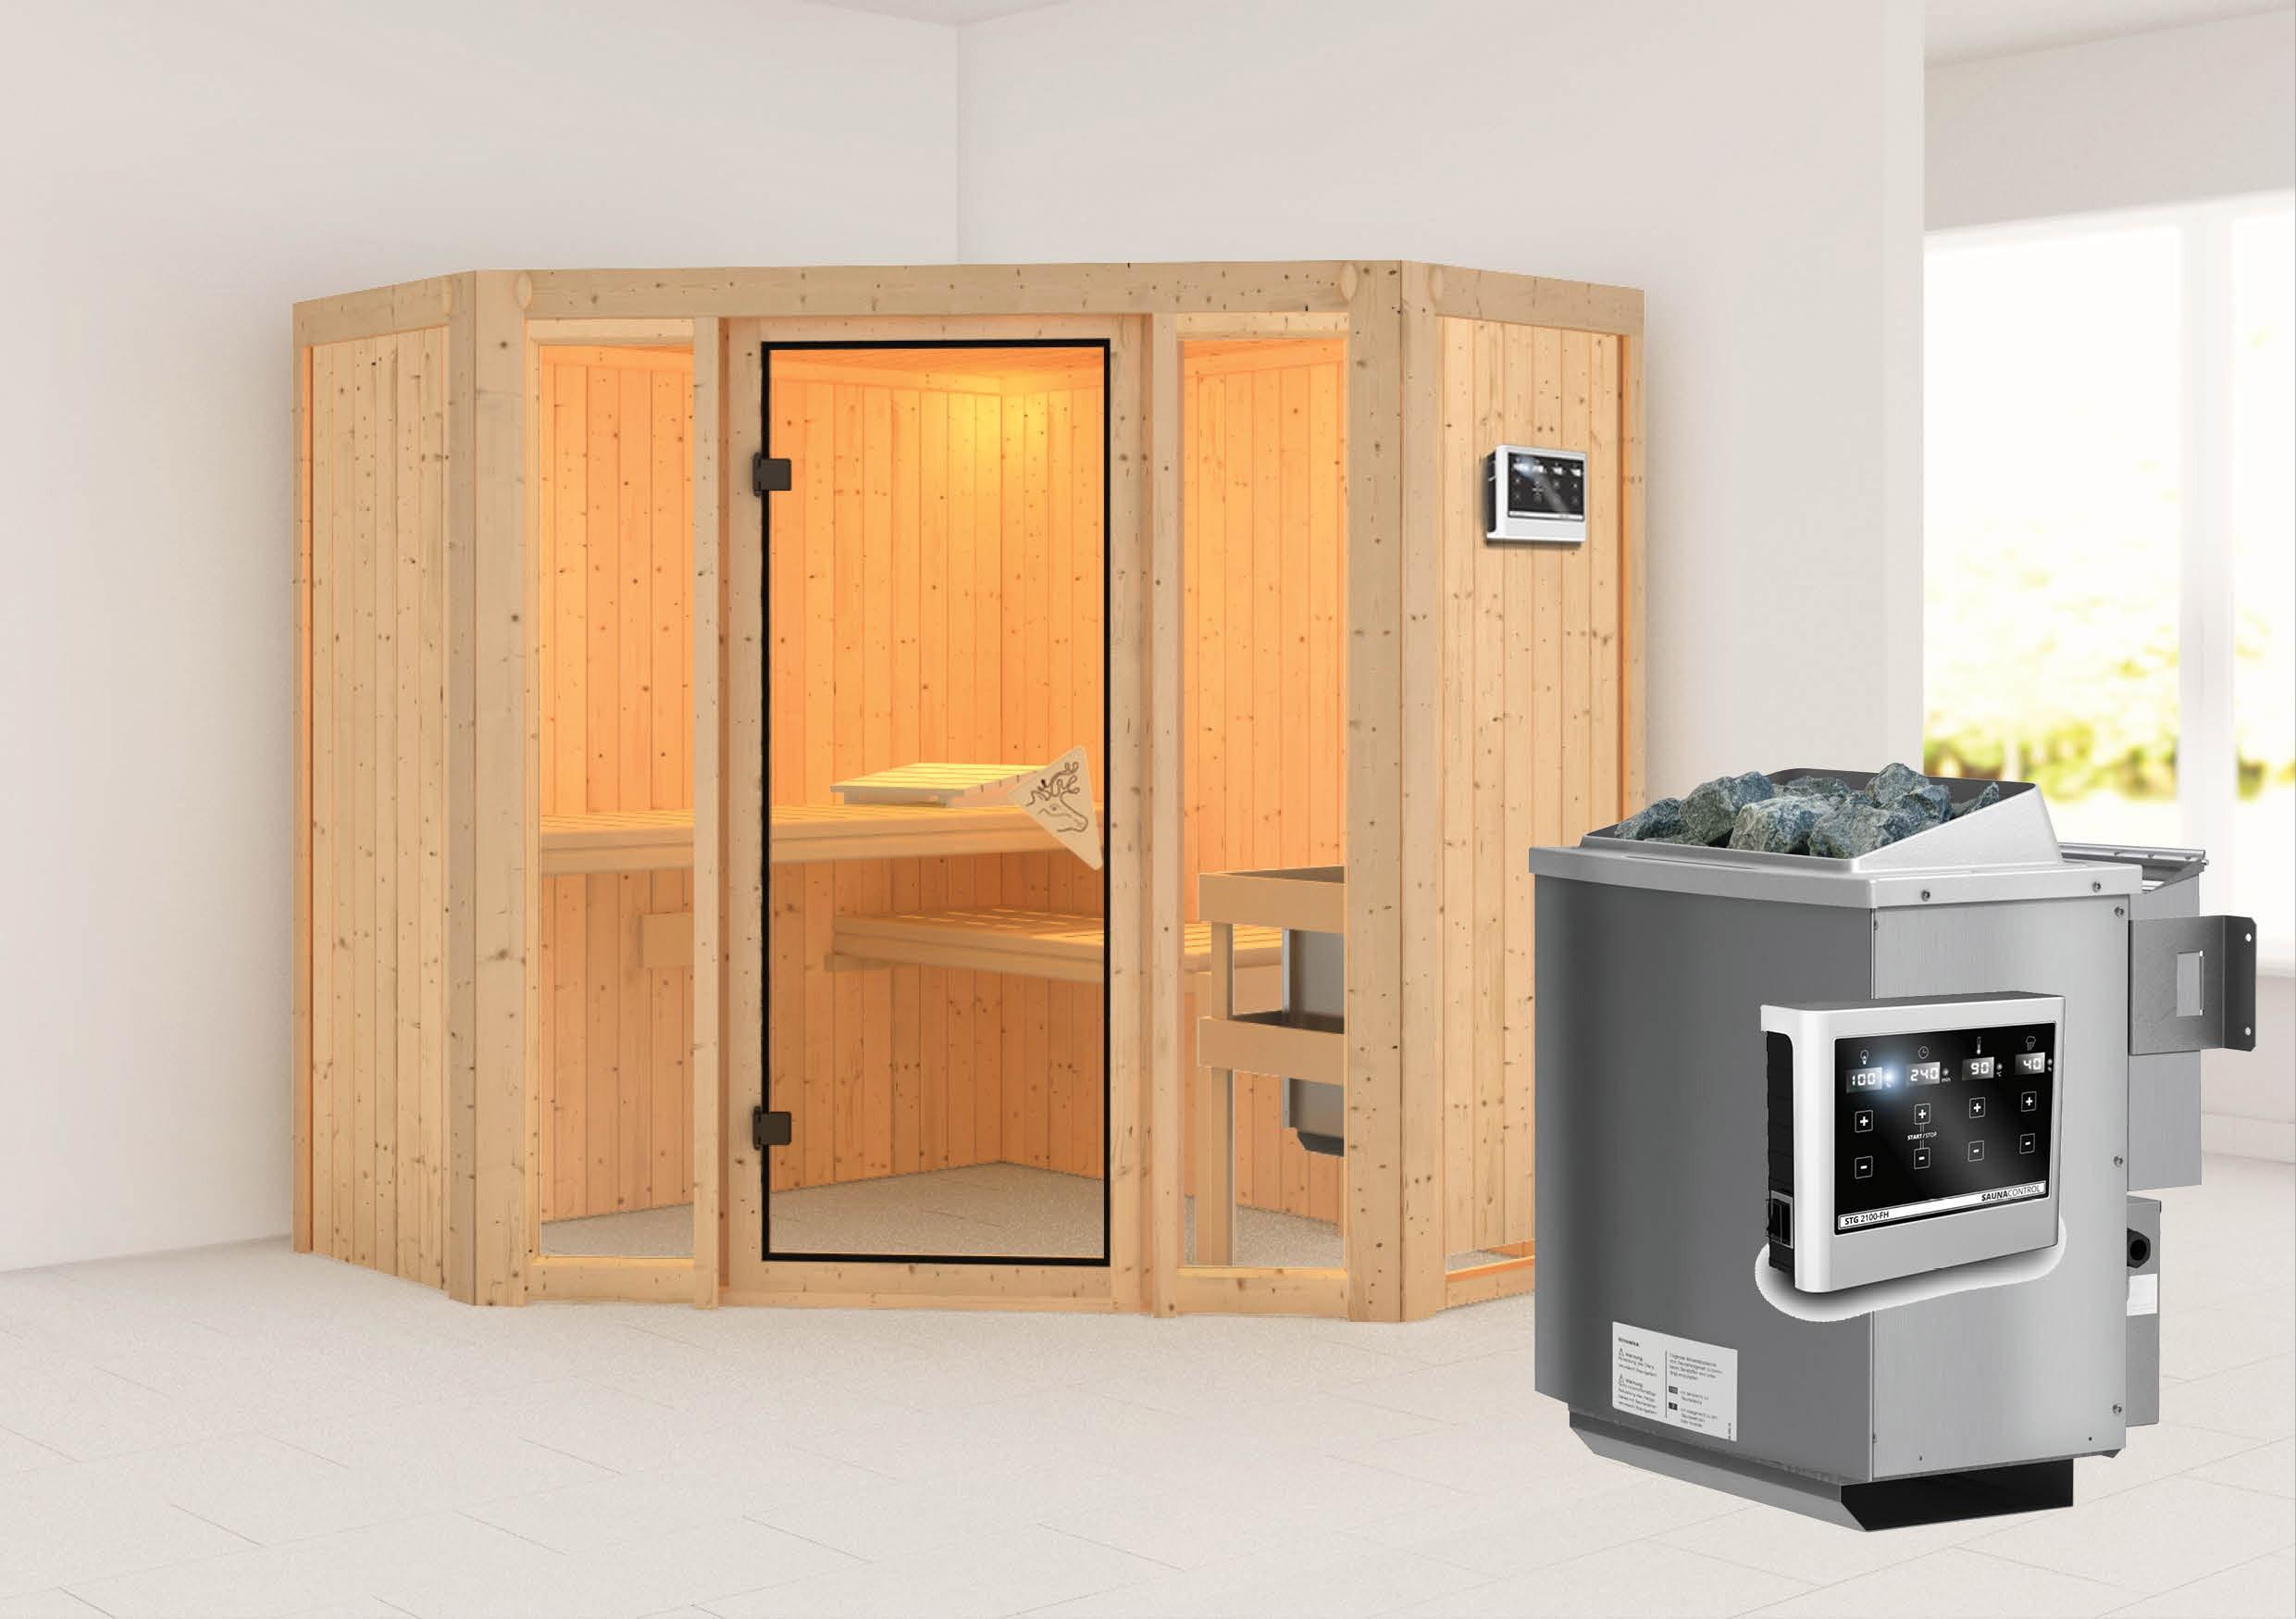 Karibu Sauna Flora 1 68mm mit Bio Ofen 9kW extern classic Tür Bild 1